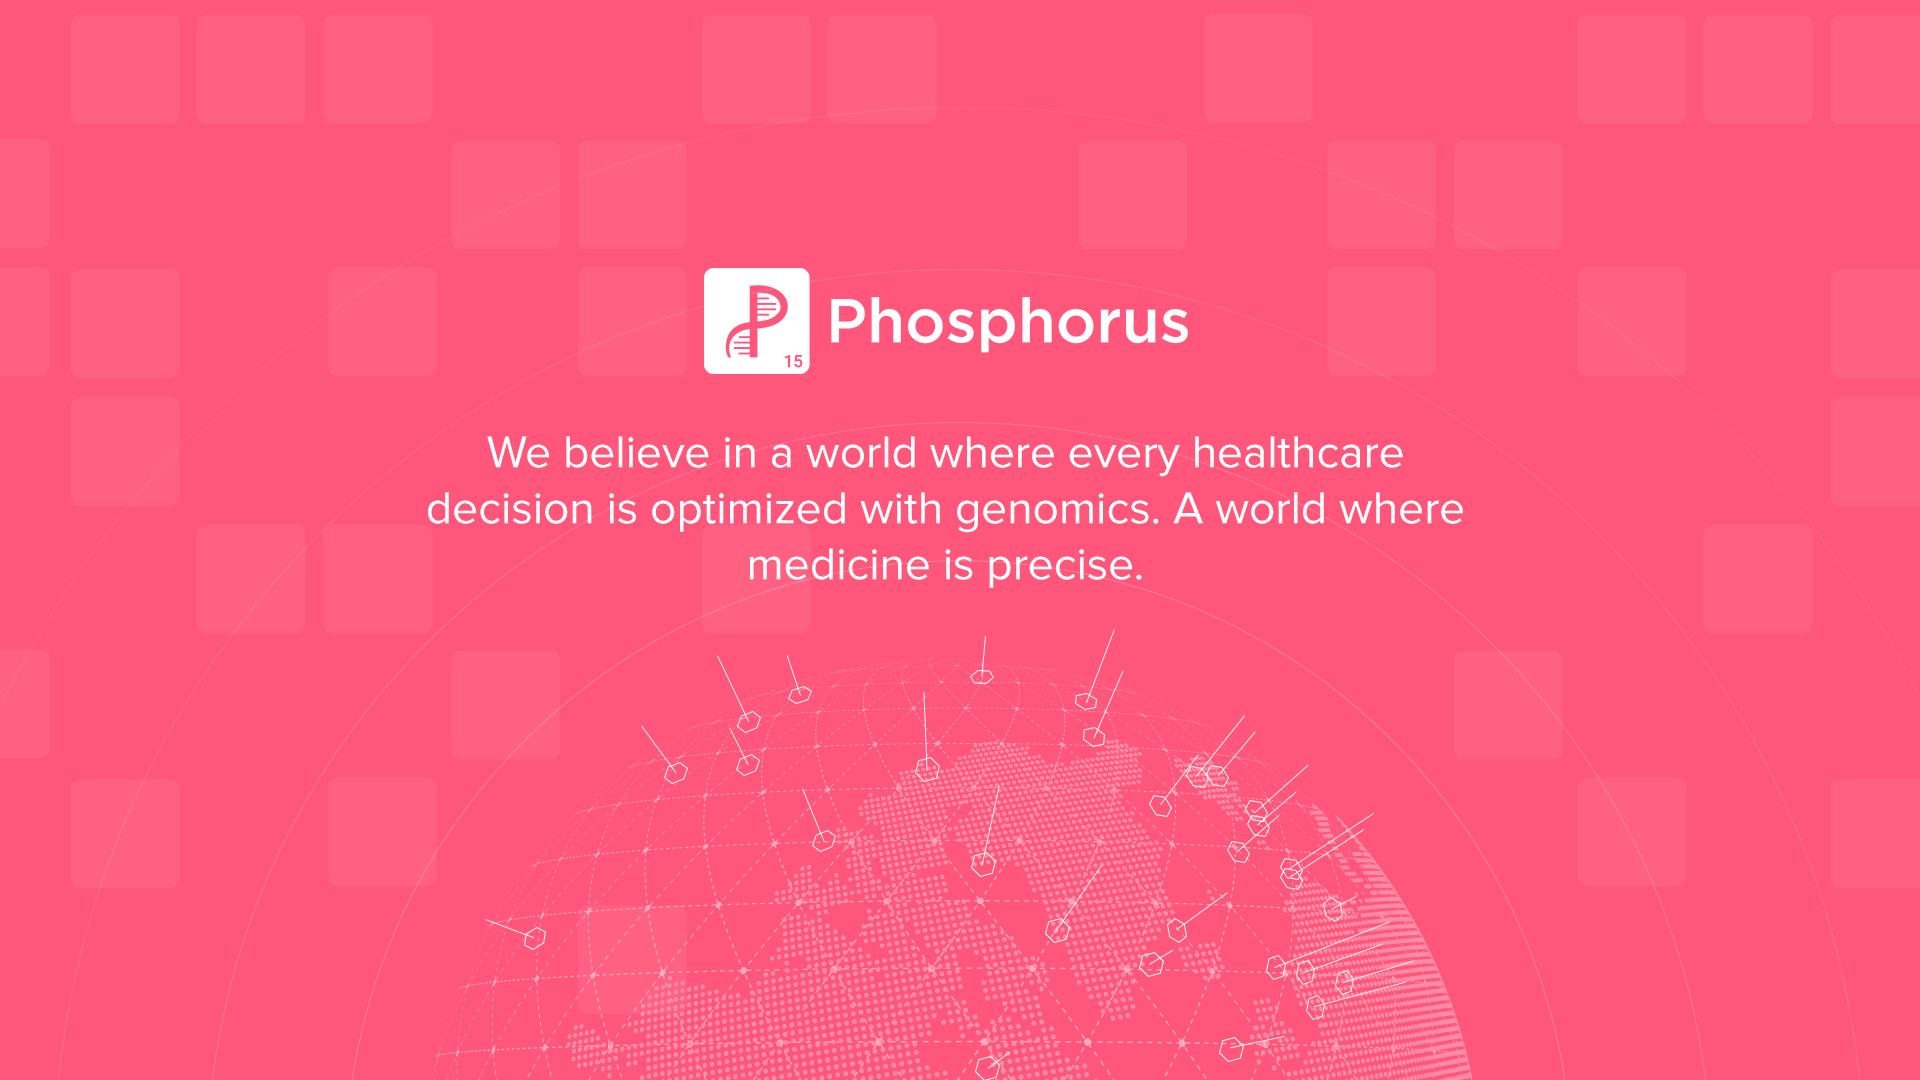 Phosphorus Website Design Preview